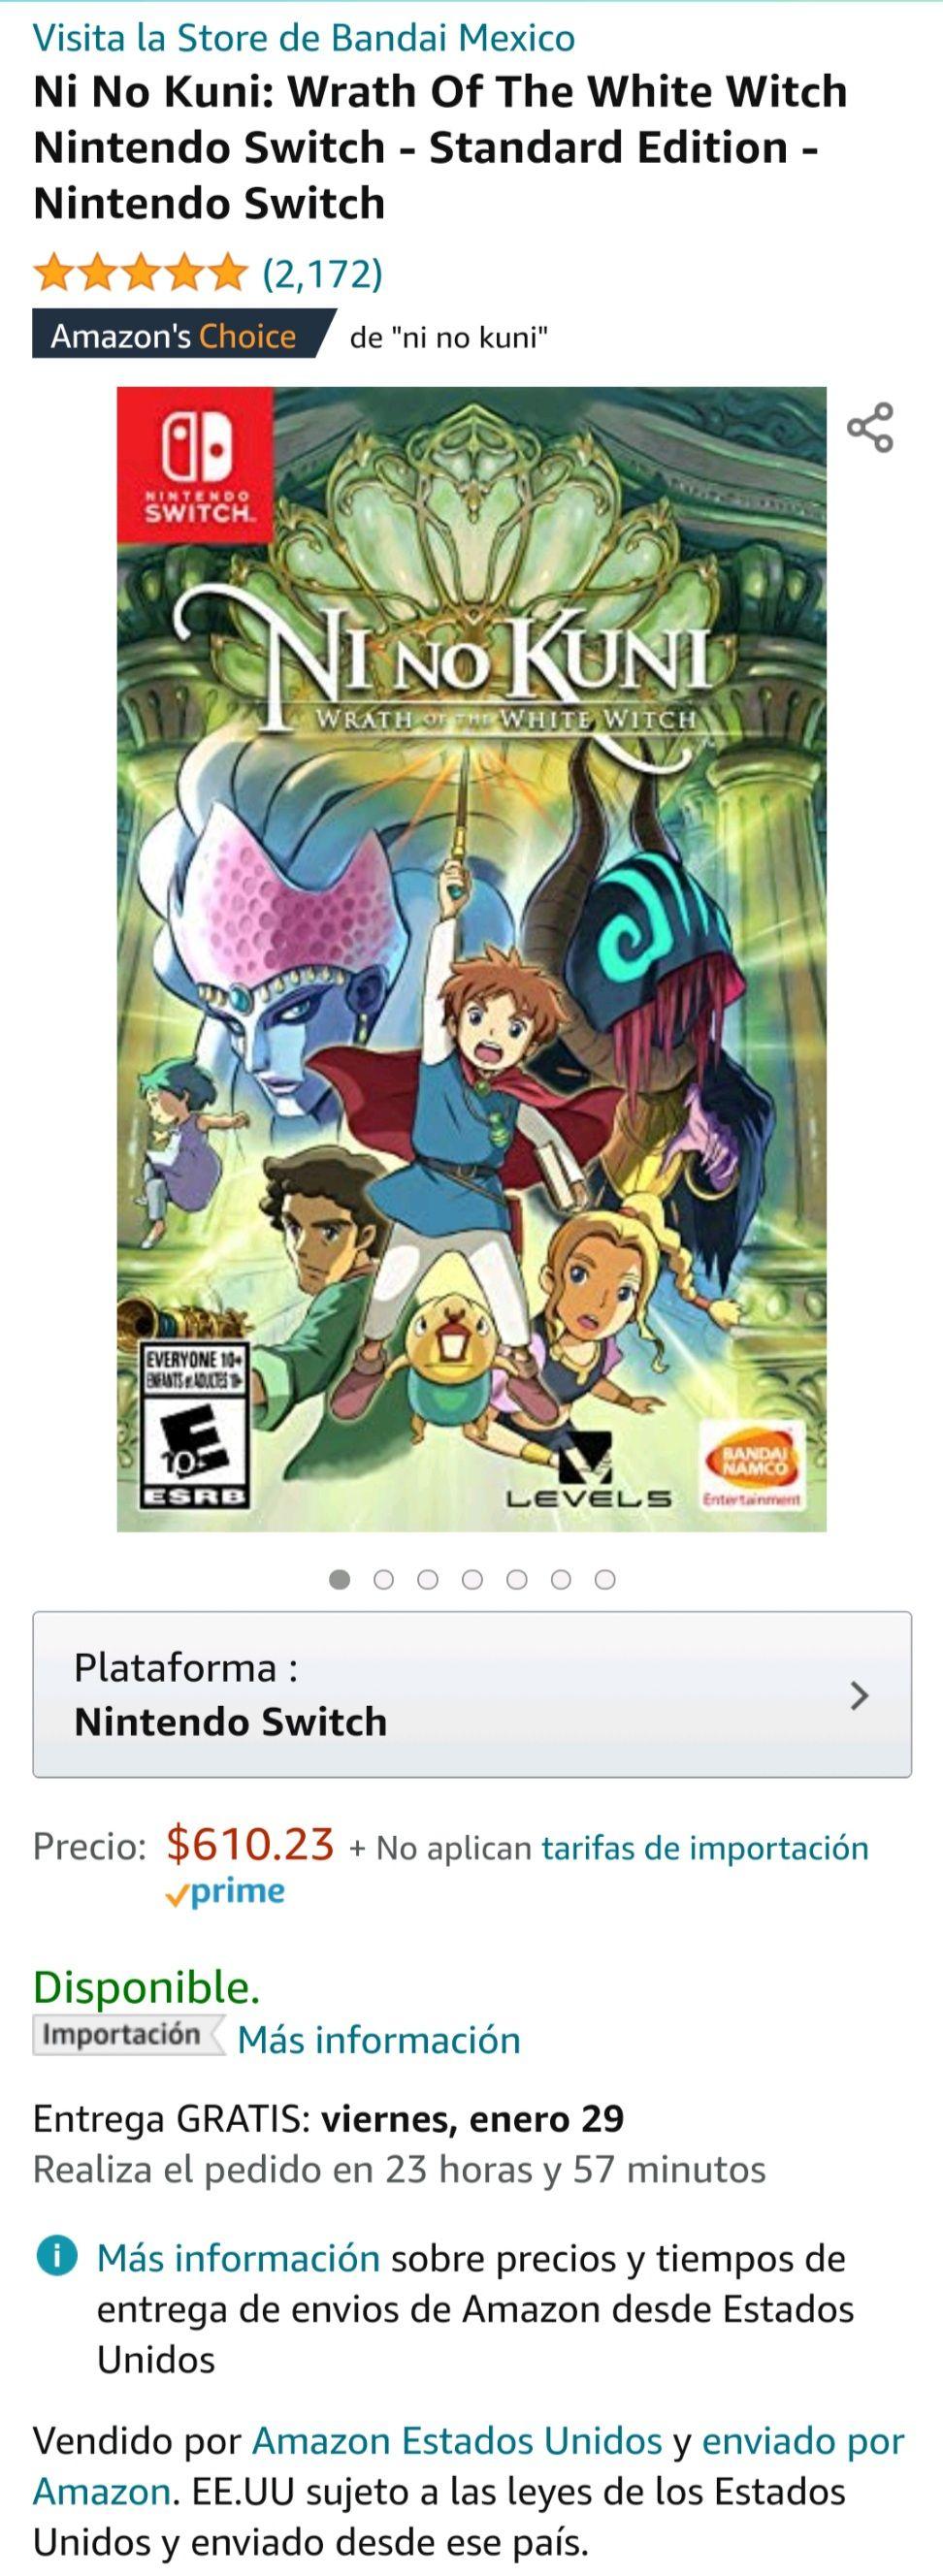 Amazon: Ni No Kuni: Wrath Of The White Witch Nintendo Switch - Standard Edition